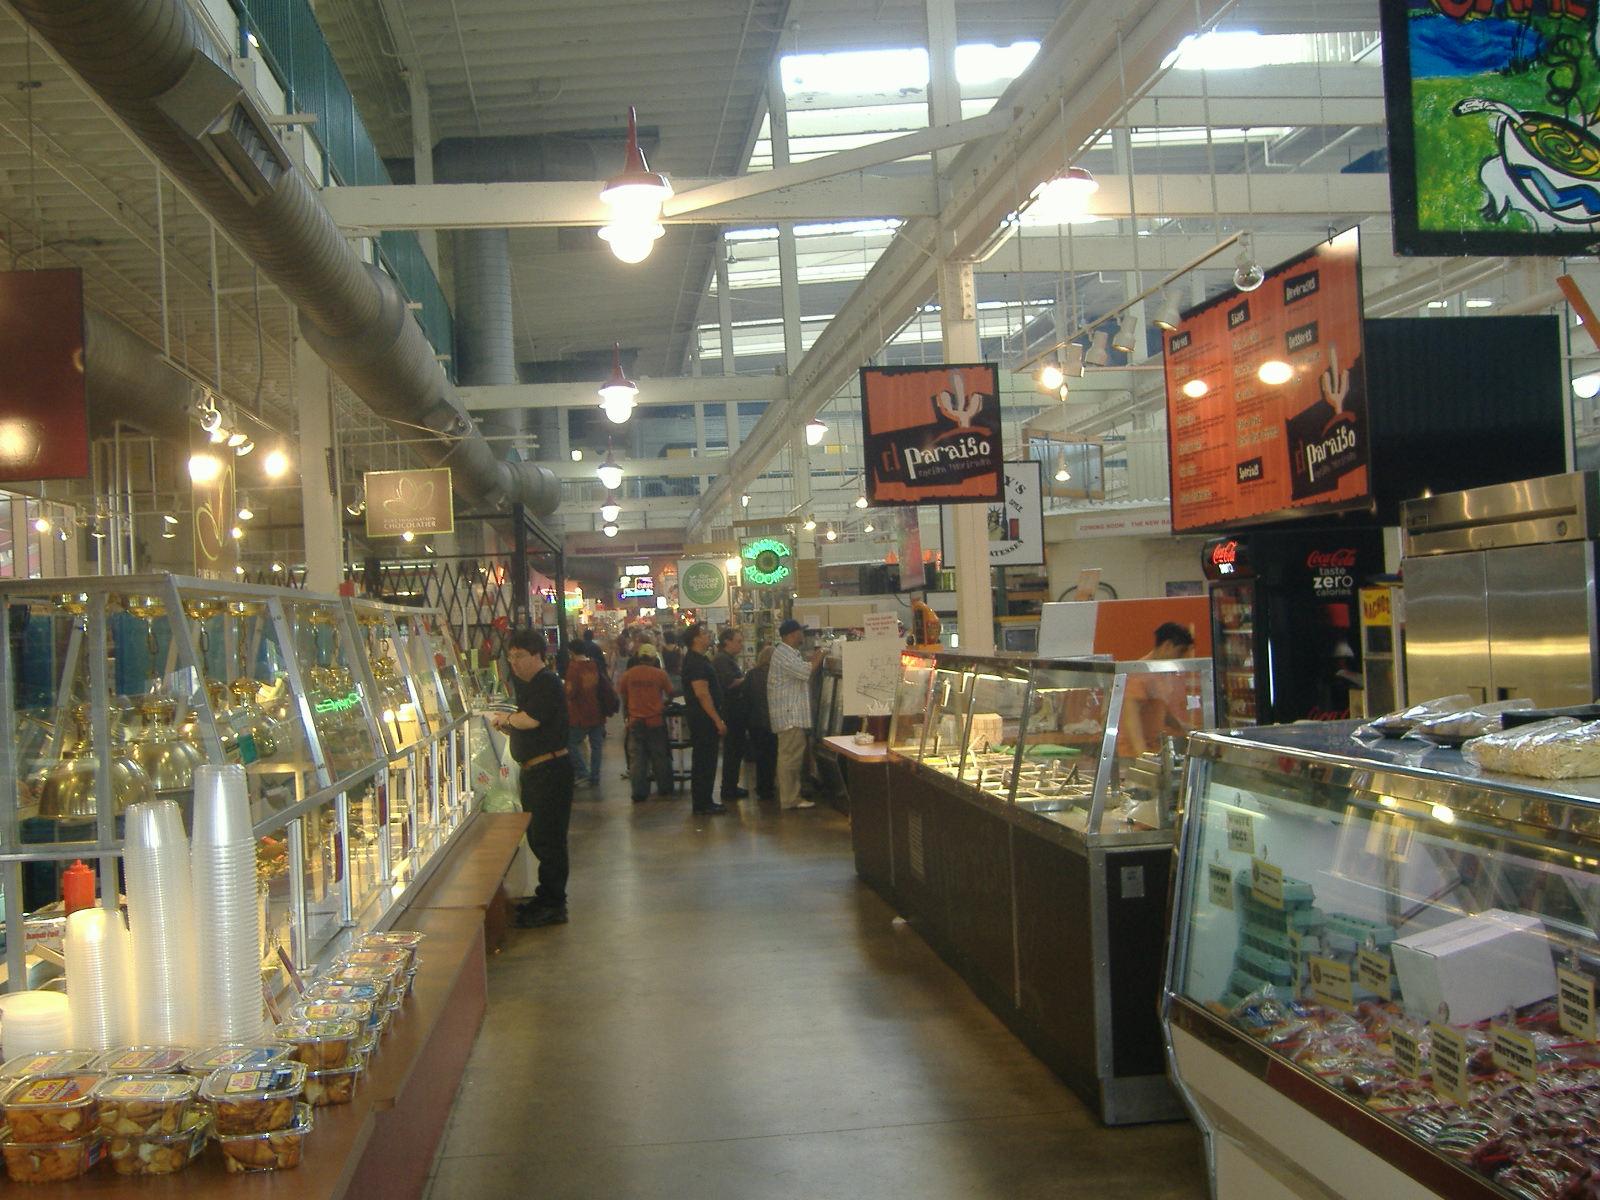 File:North Market Interior.JPG